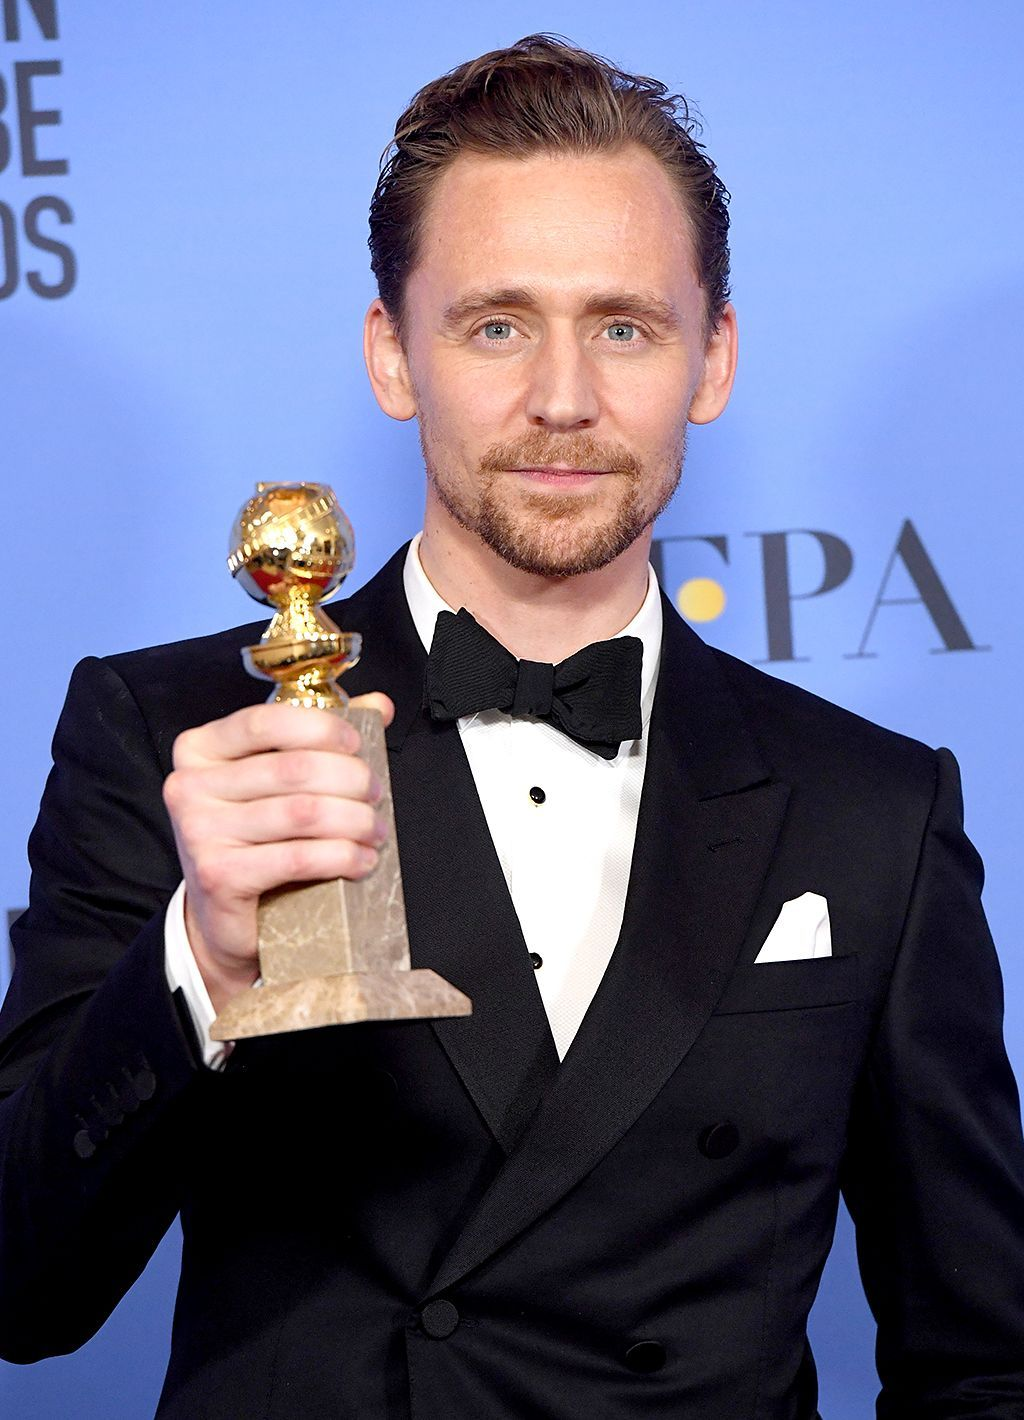 Tom Hiddleston's Golden Globes celebration sure ended swiftly.